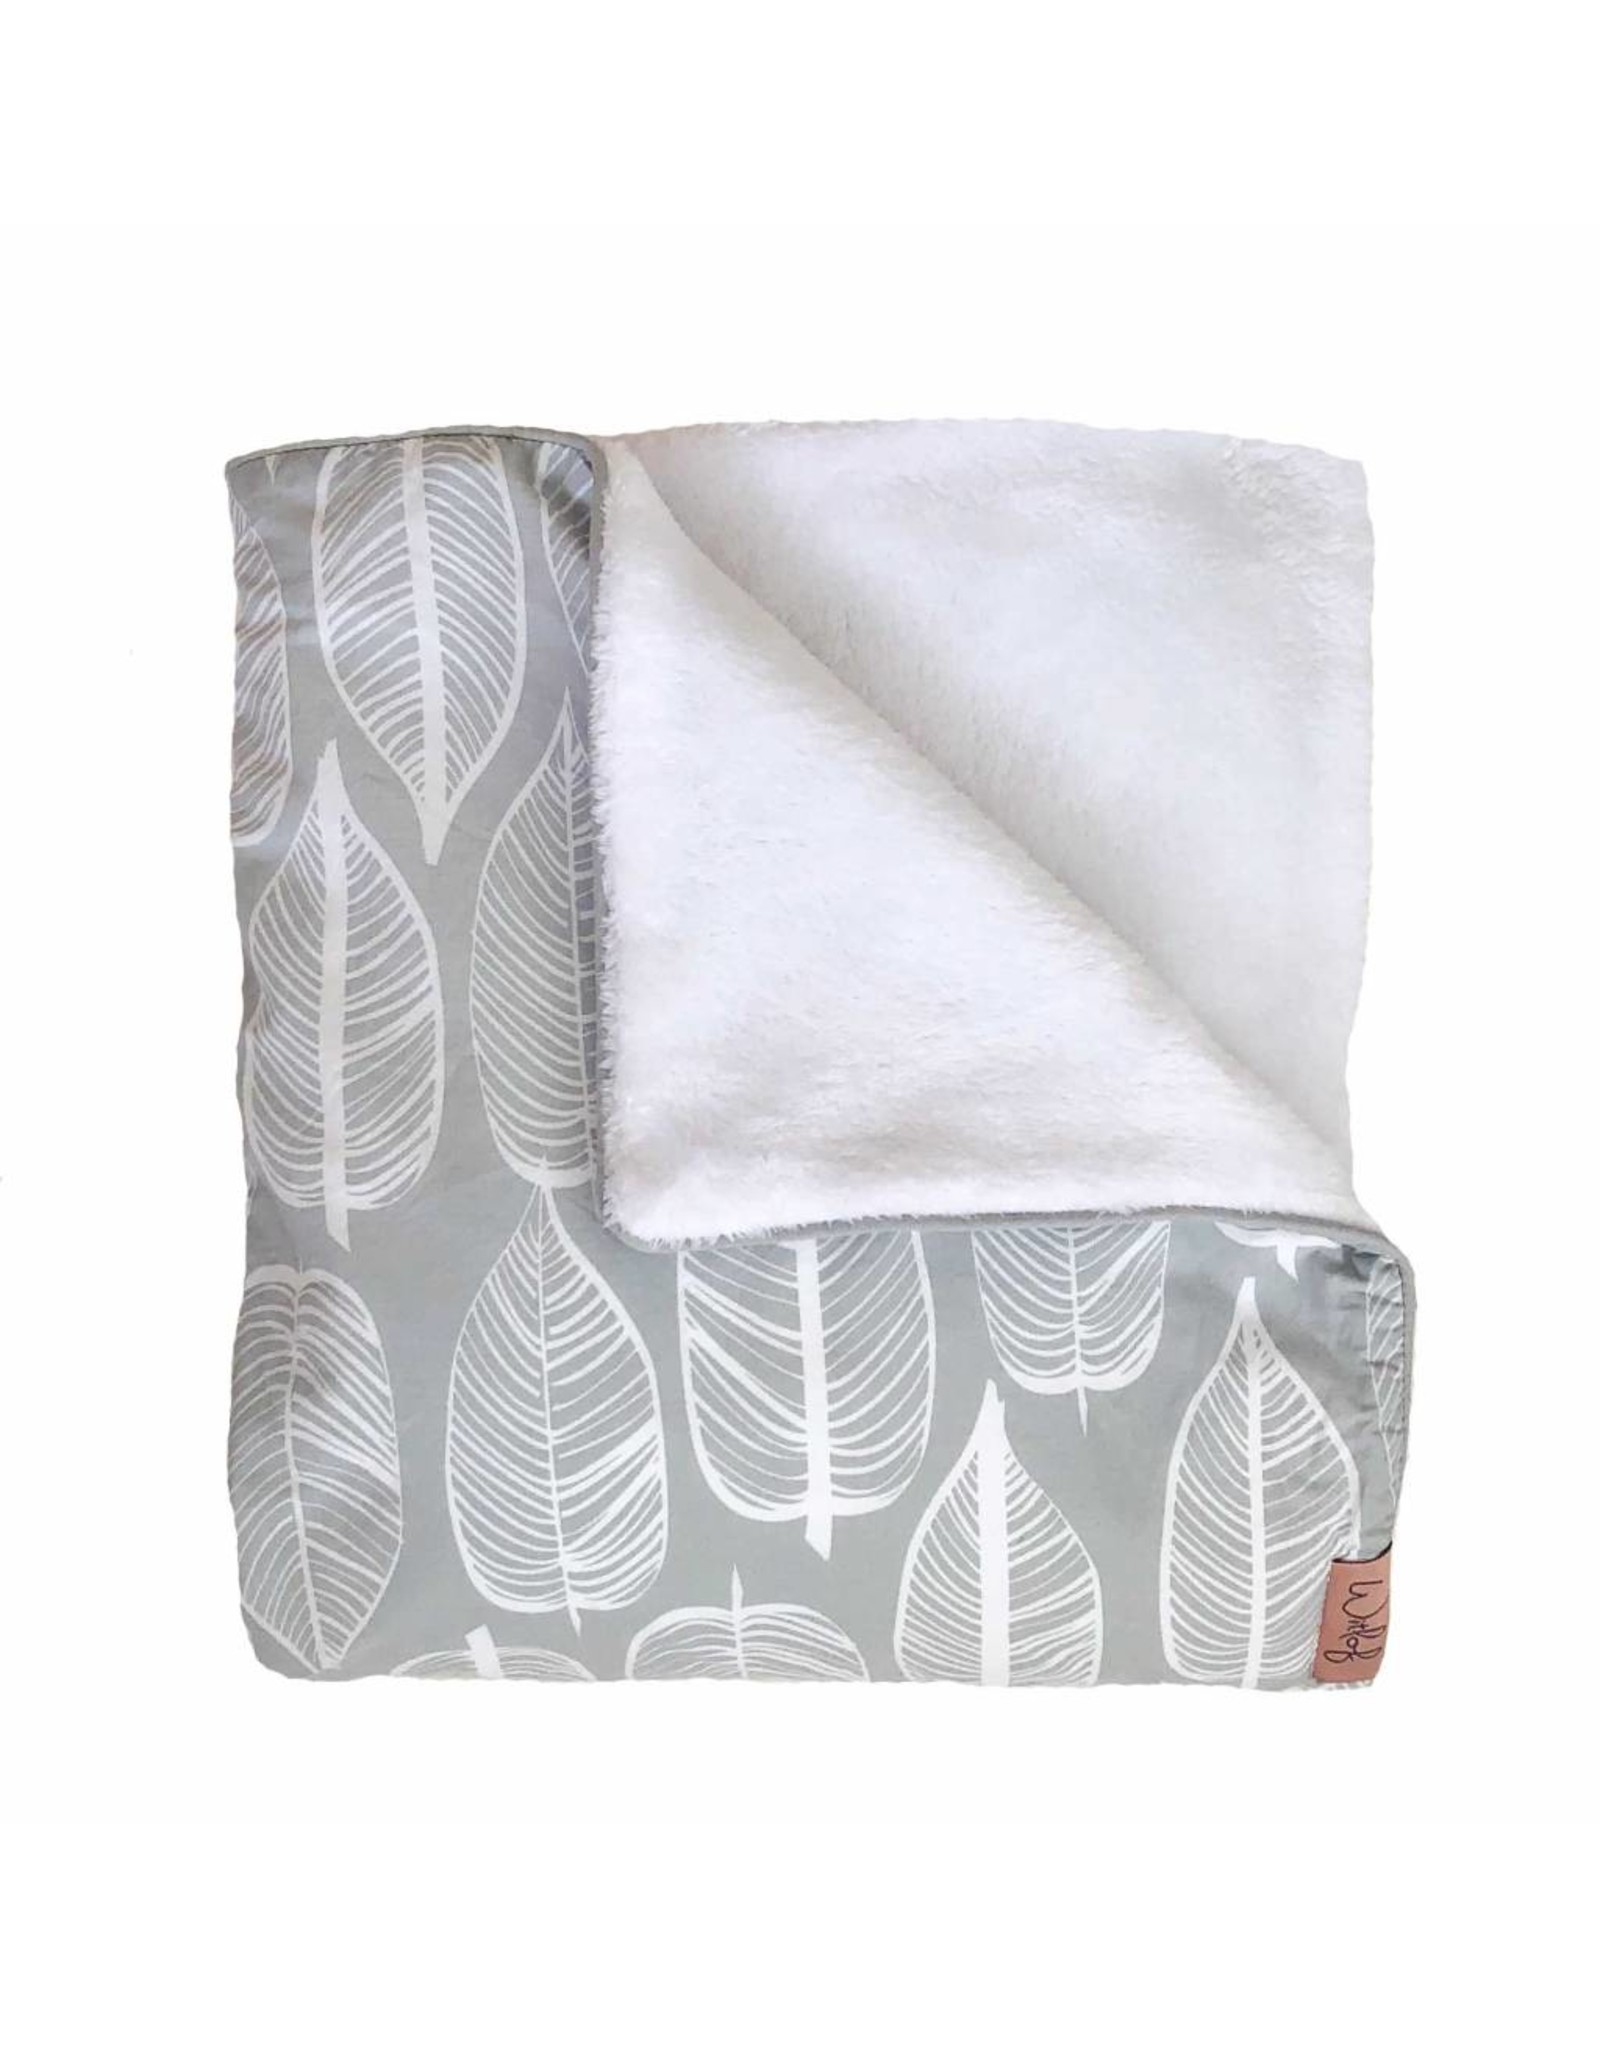 witlof for kids Witlof for kids Tuck-in 40x80 Beleaf Warm Grey/White